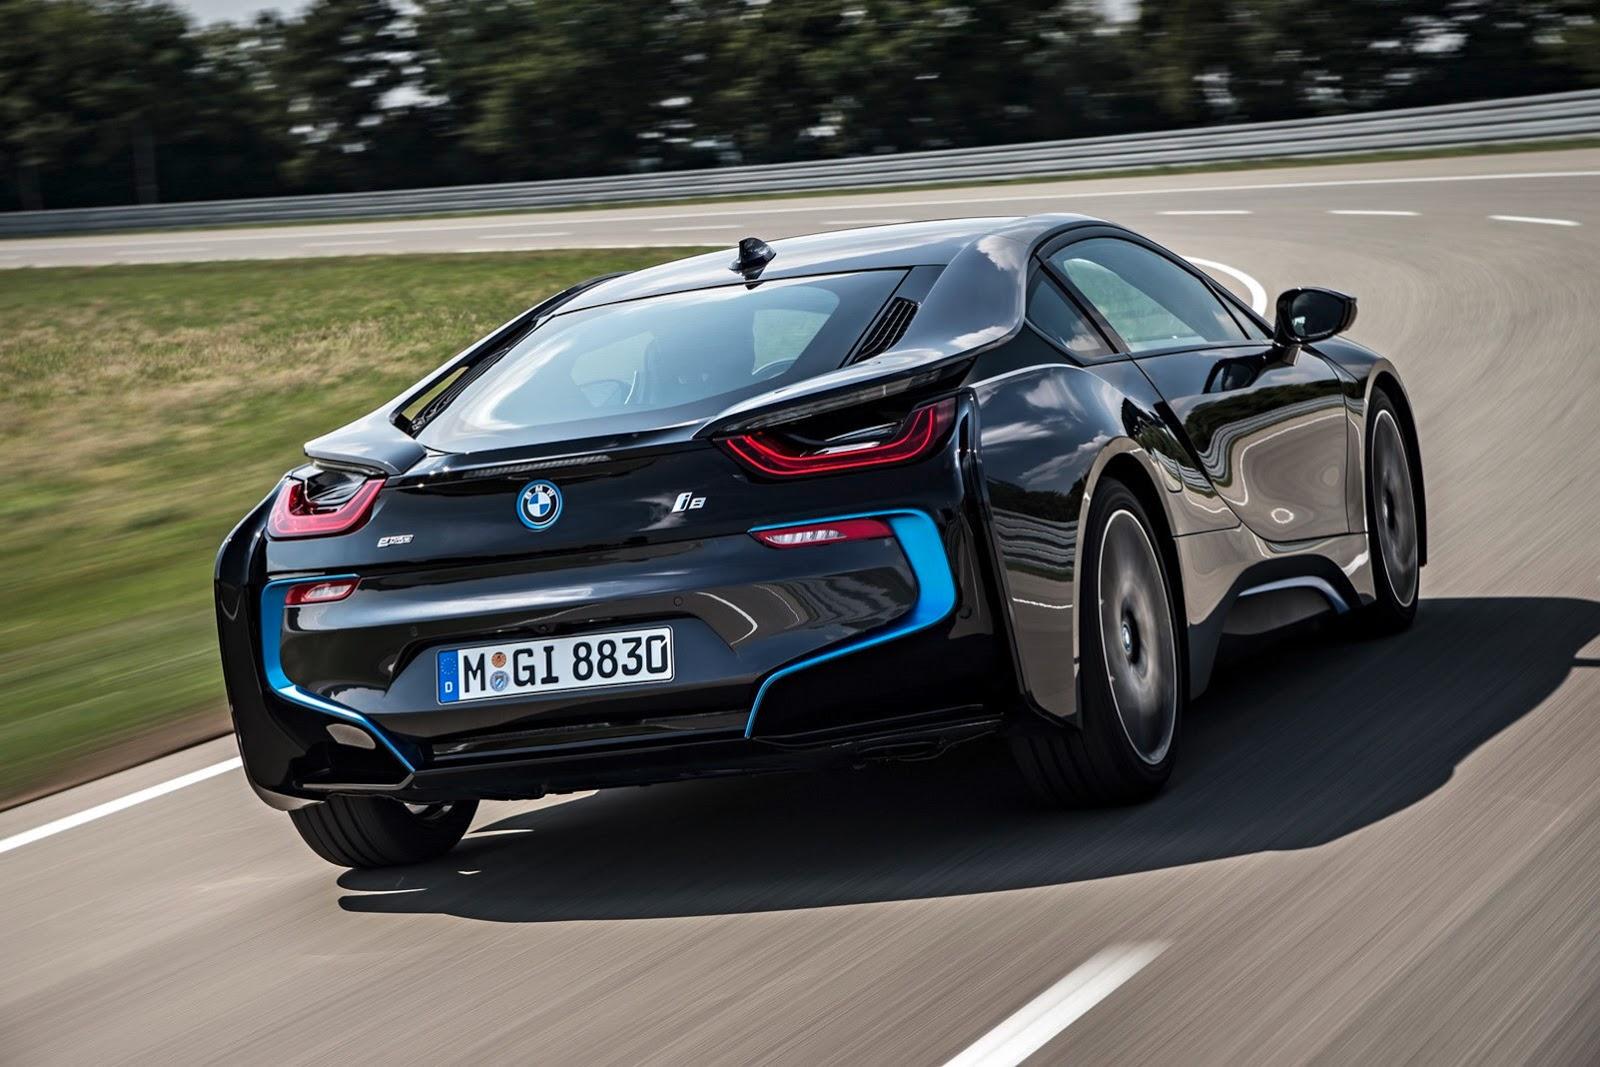 BMW i8 Plug-In Hybrid Sports Car - AutoTribute